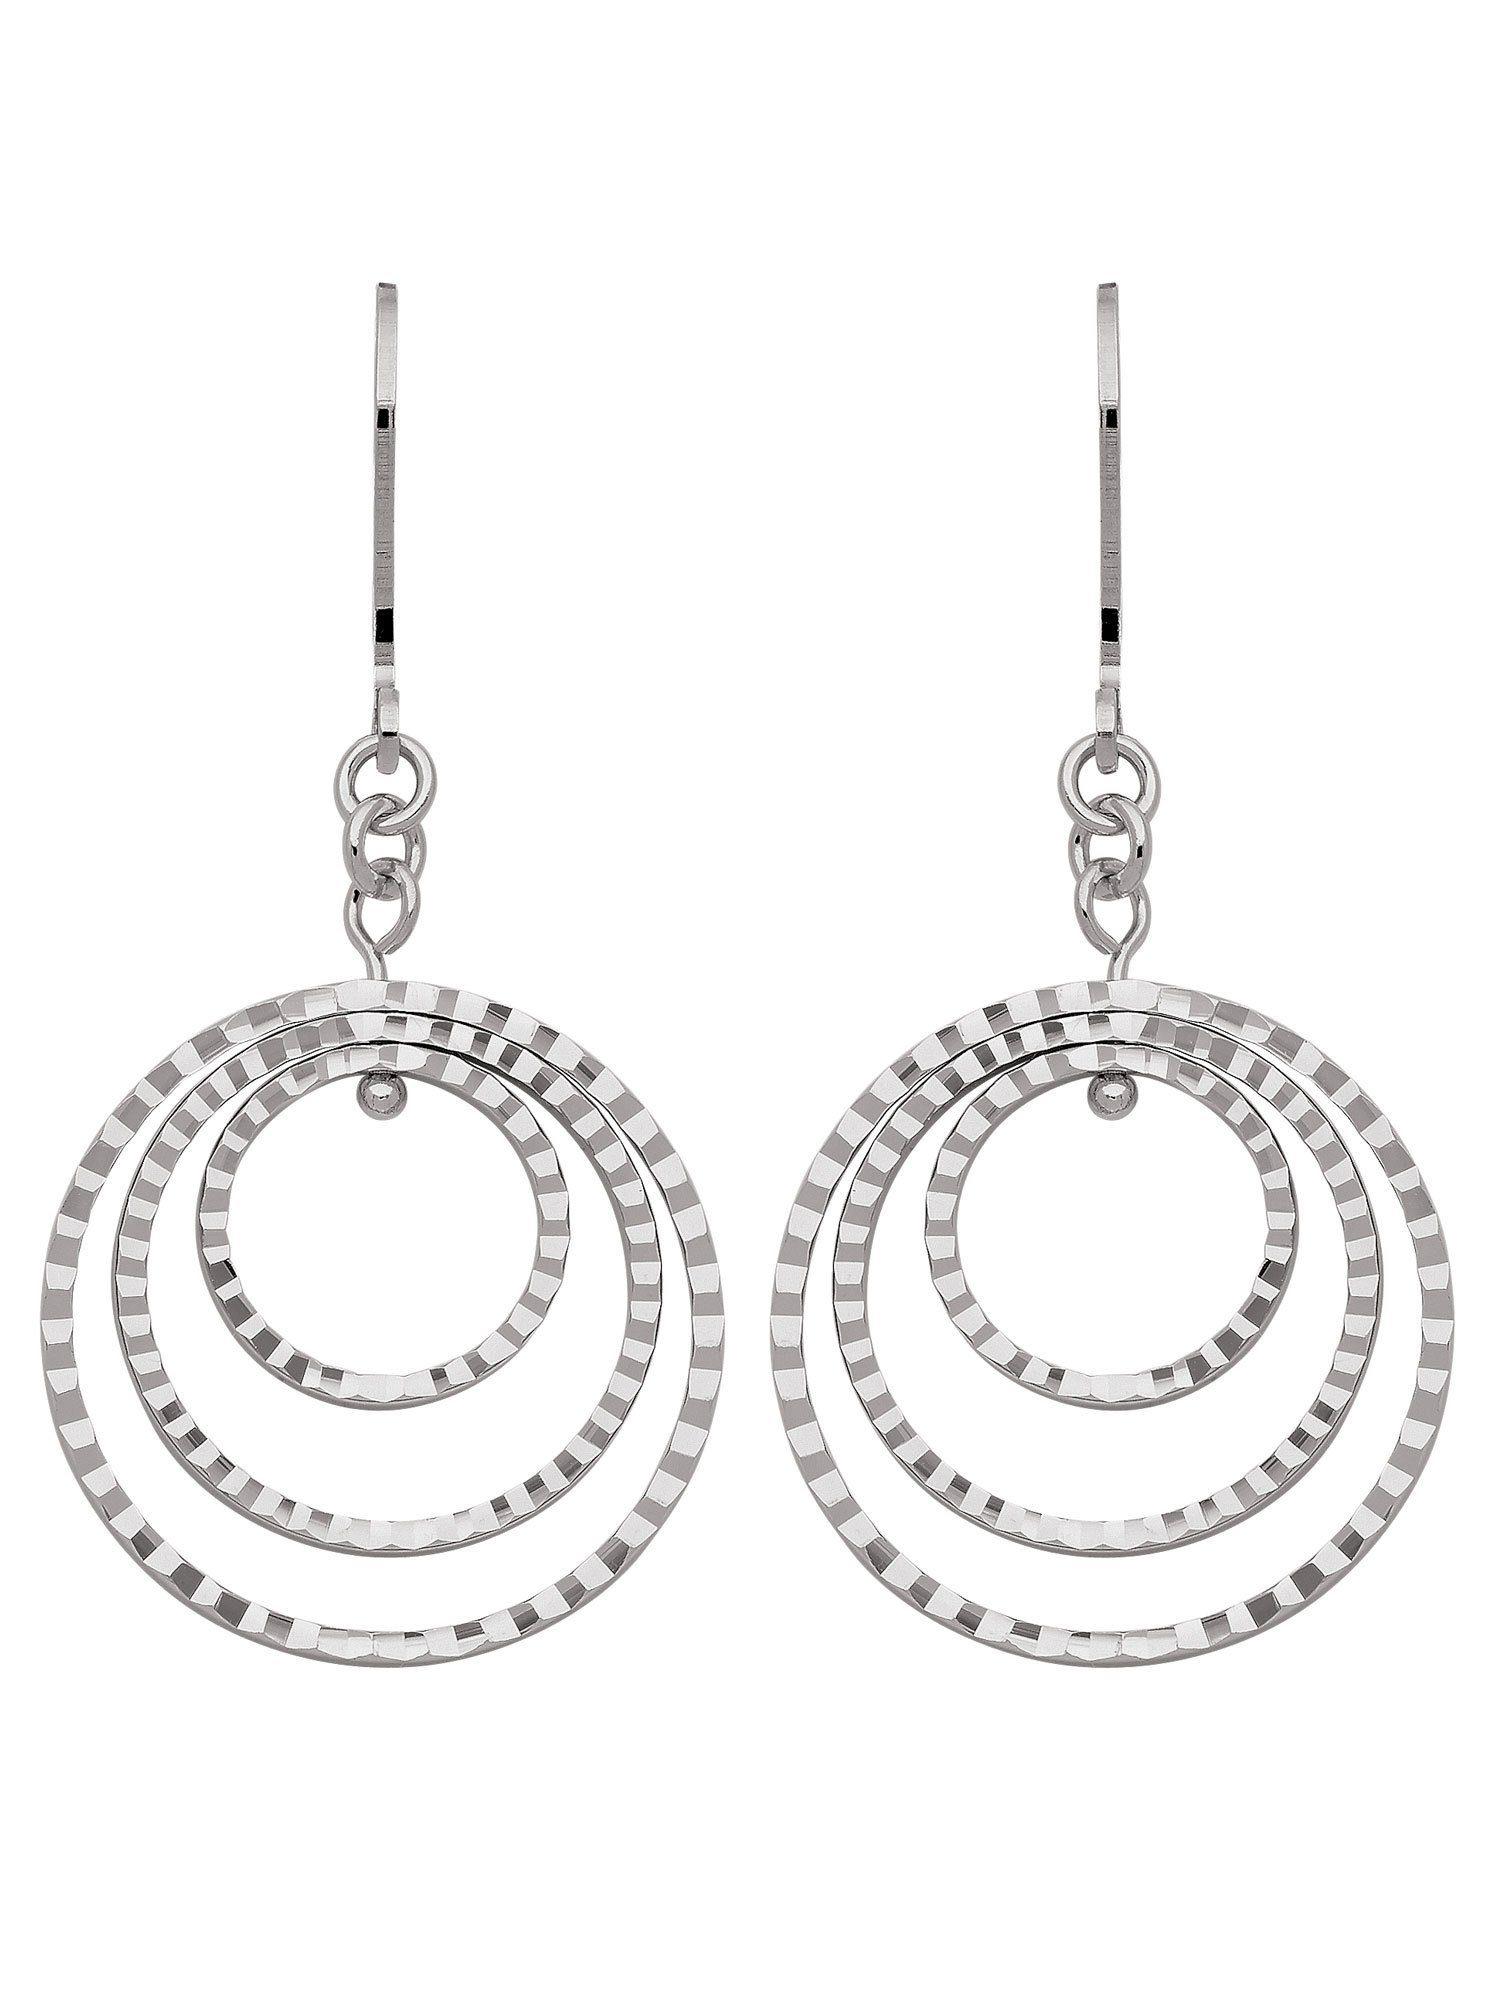 Adelia´s Paar Ohrhänger »Silber 925 Sterling Silver Ohrringe - Ohrhänger« 925 Sterling Silber Ø 2.21 cm